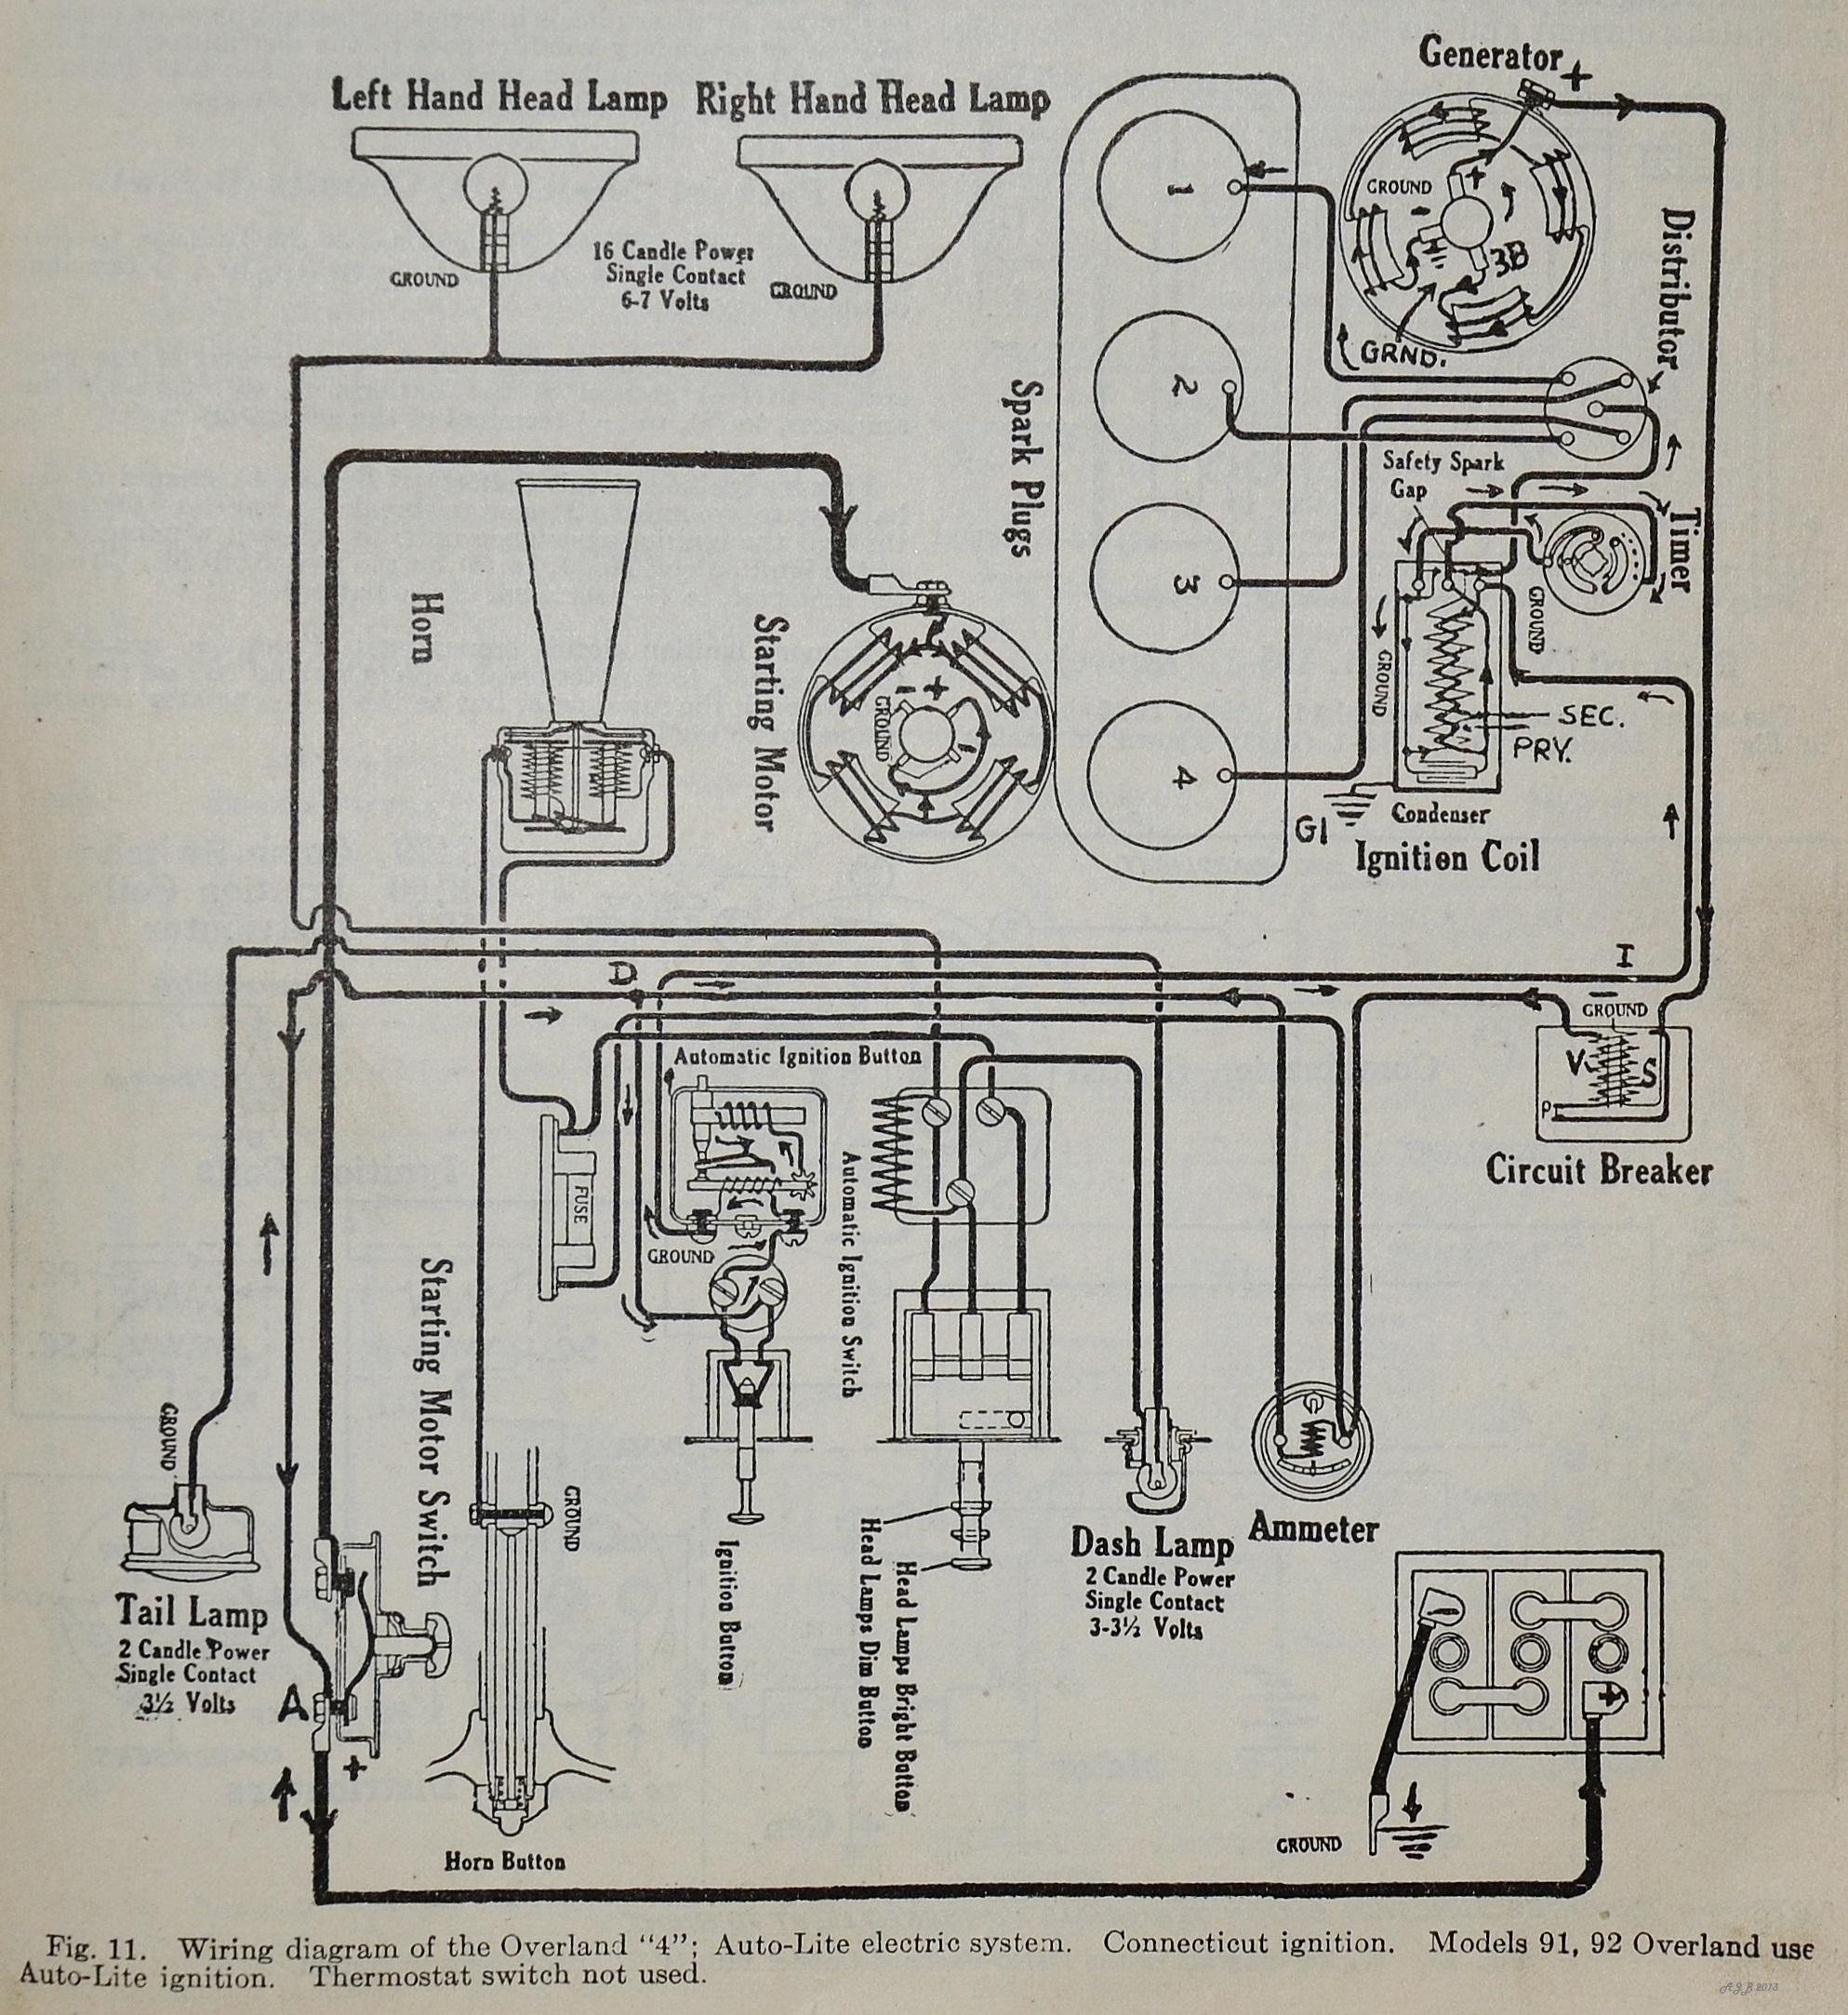 Overland 32 Wiring Diagram